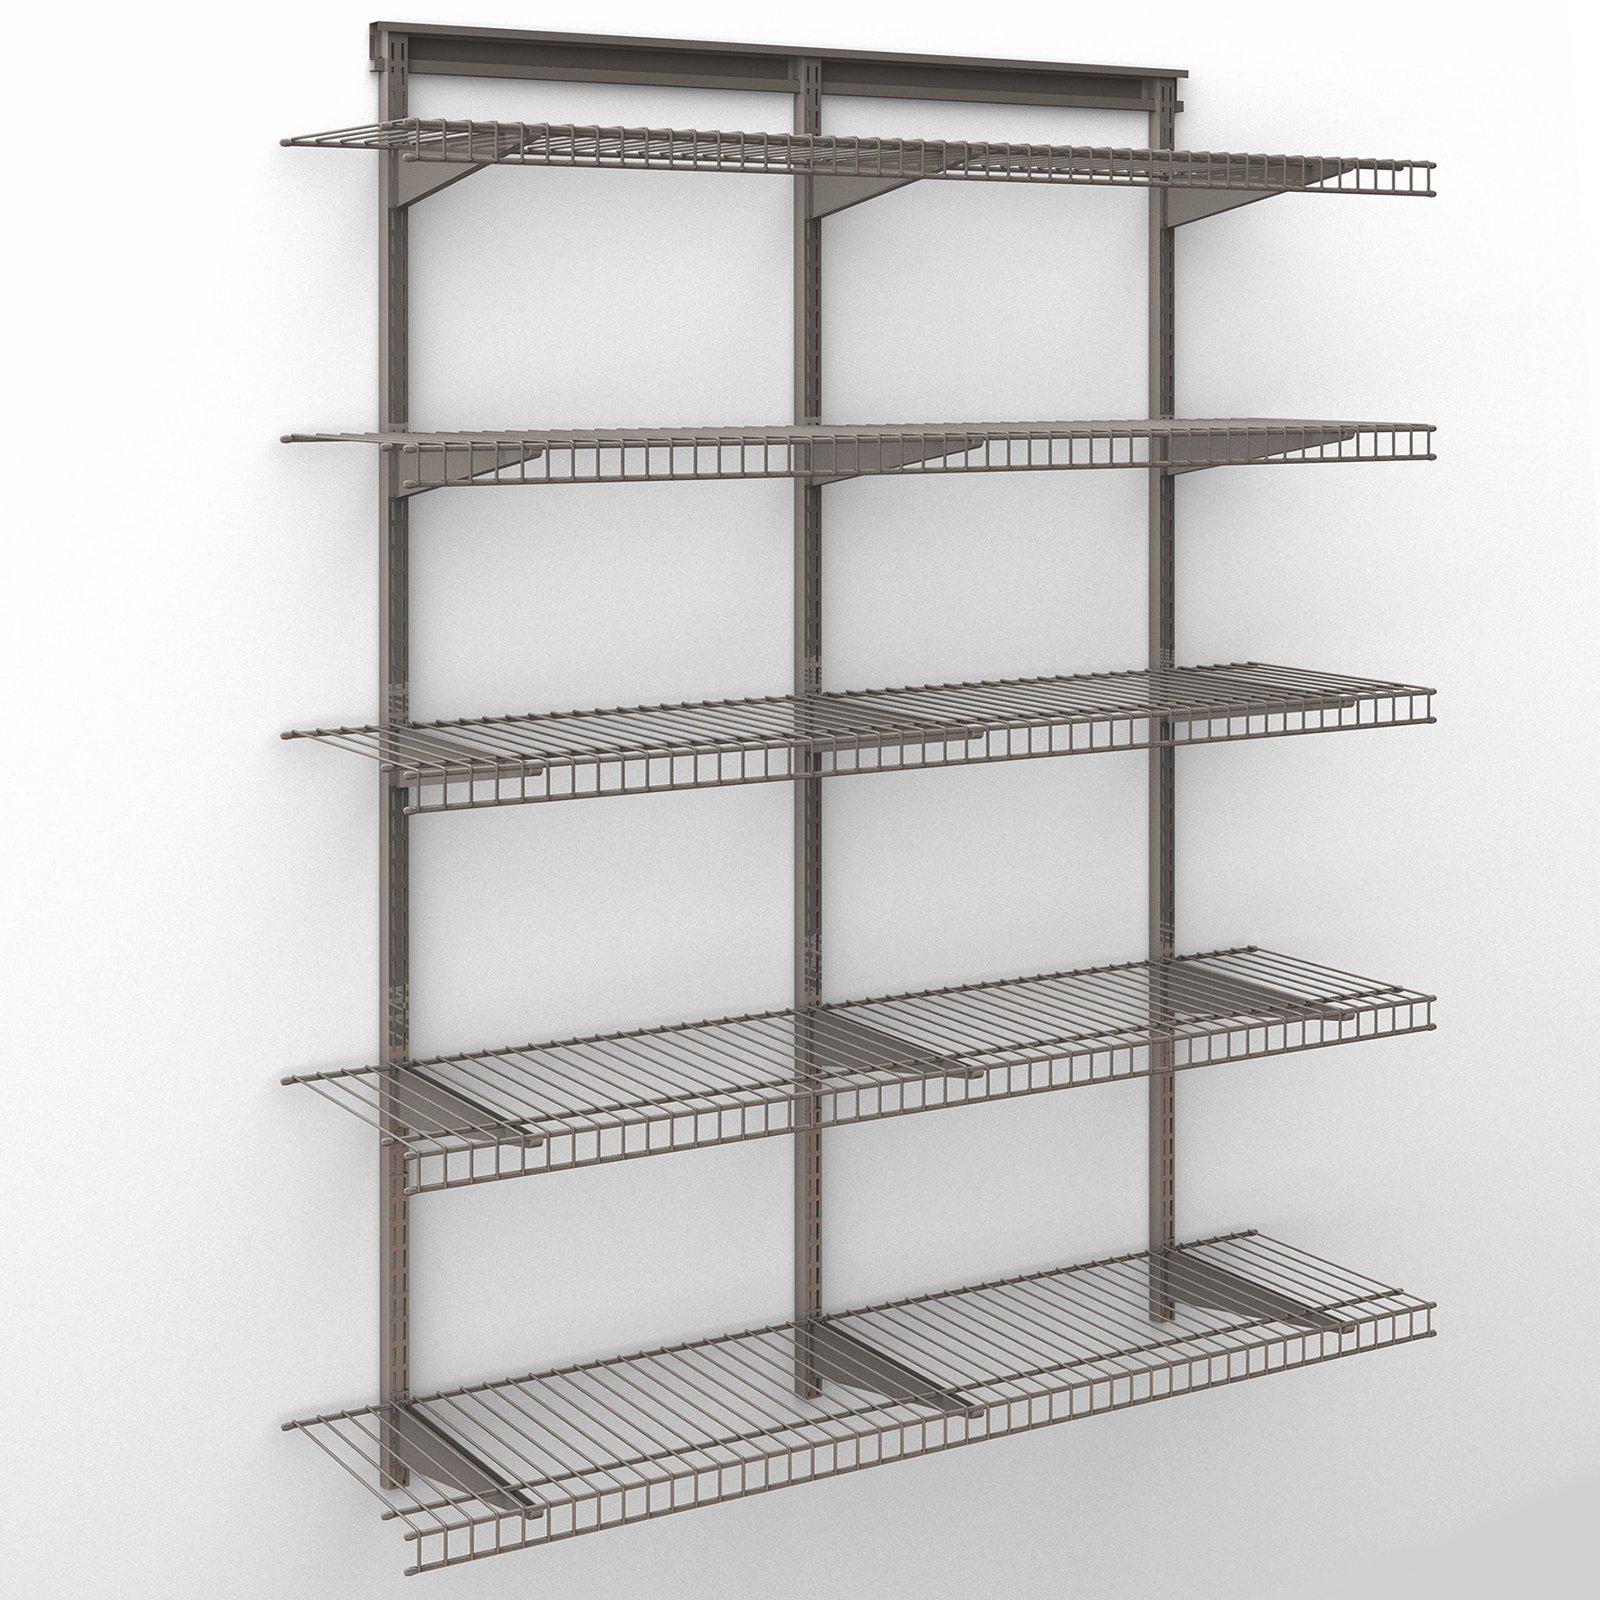 ClosetMaid ShelfTrack 4 Ft. Wire Shelf Kit - Walmart.com